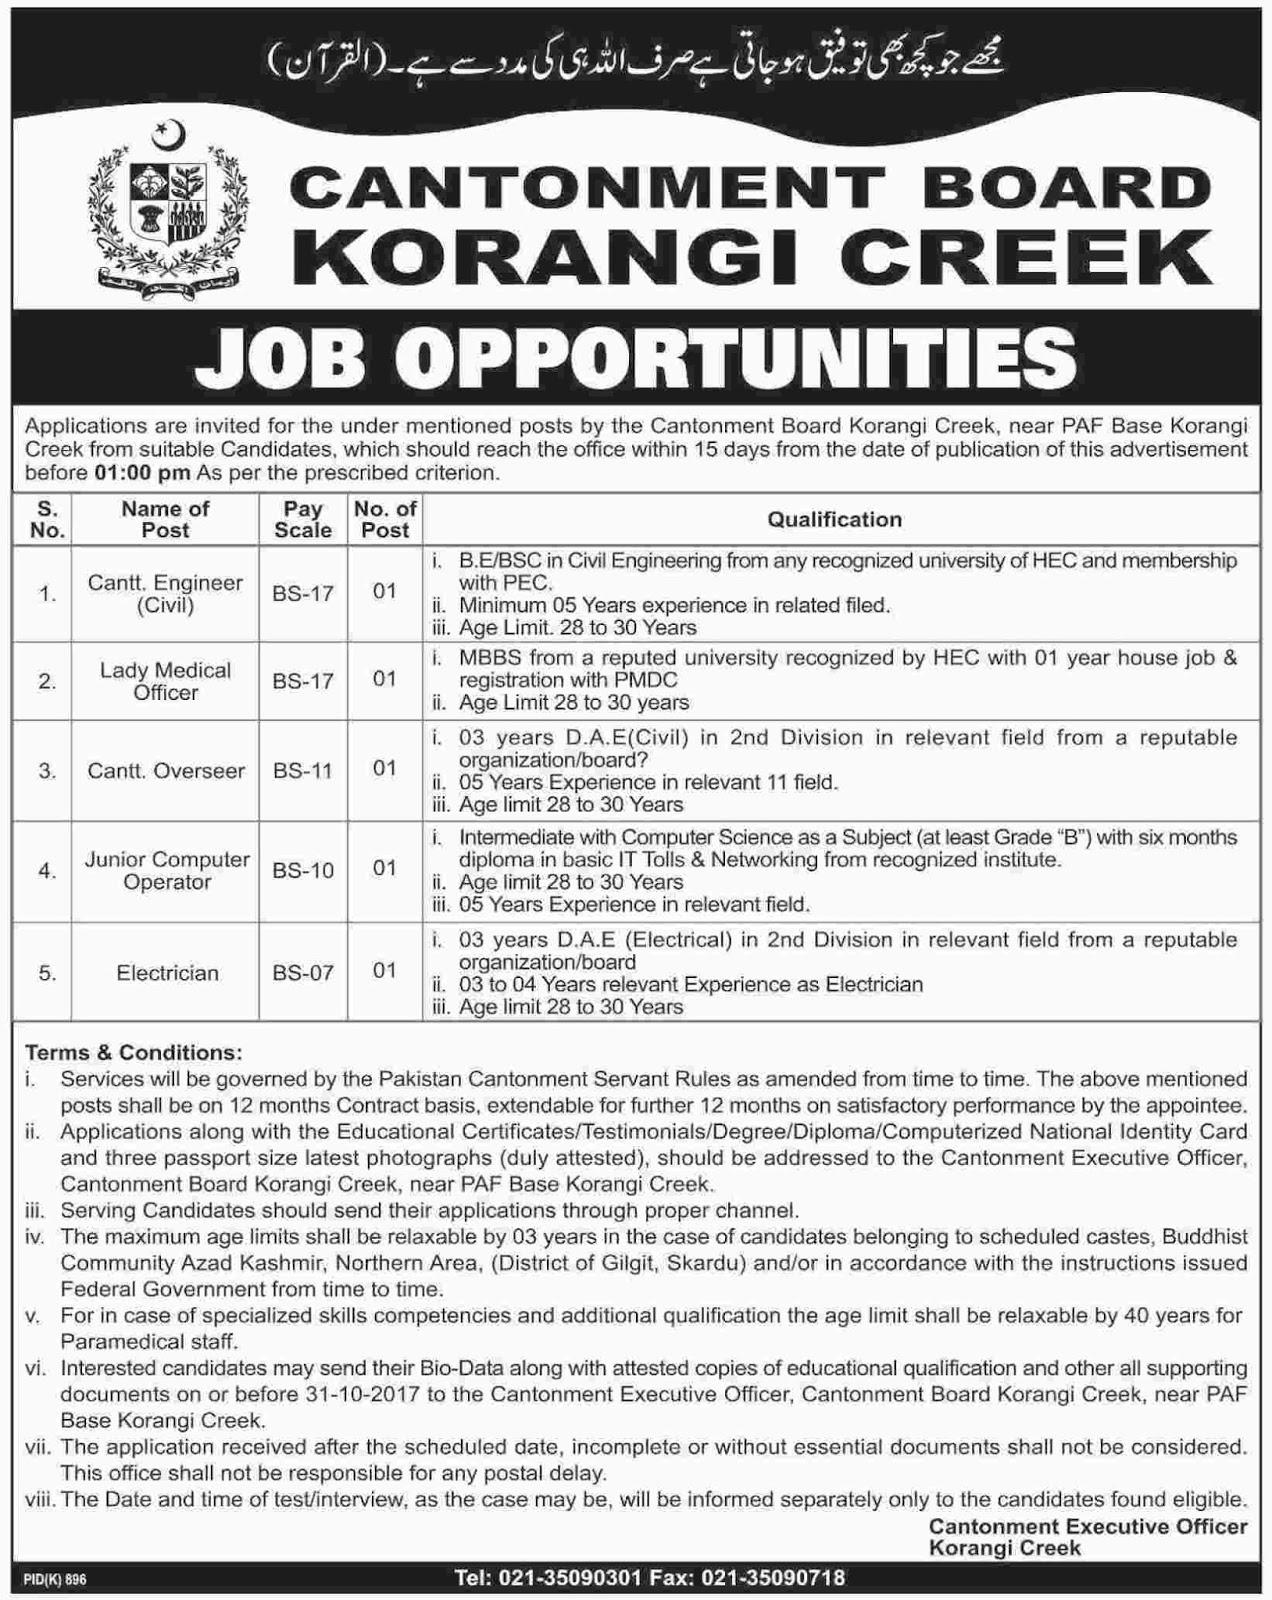 Jobs In Cantonment Board Korangi Creek - 2017